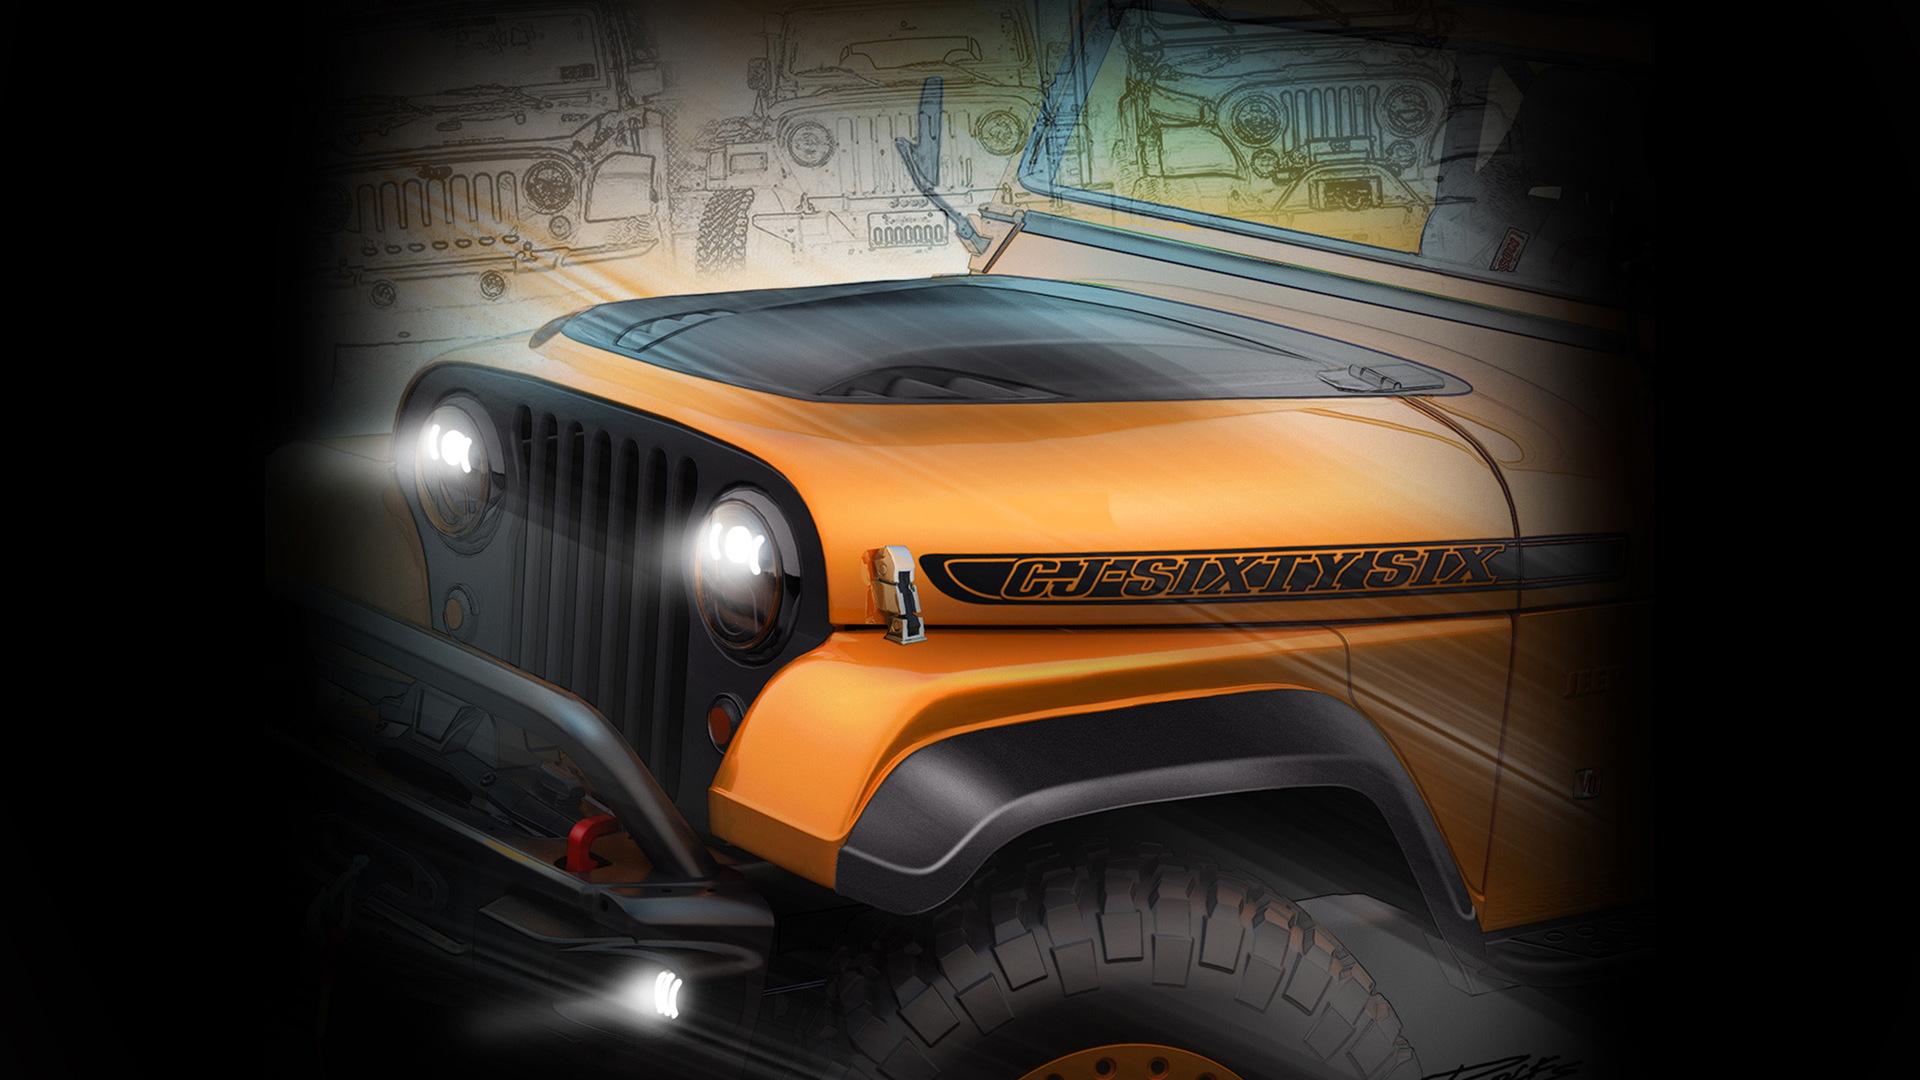 Jeep Wrangler Mopar concept, 2016 SEMA show